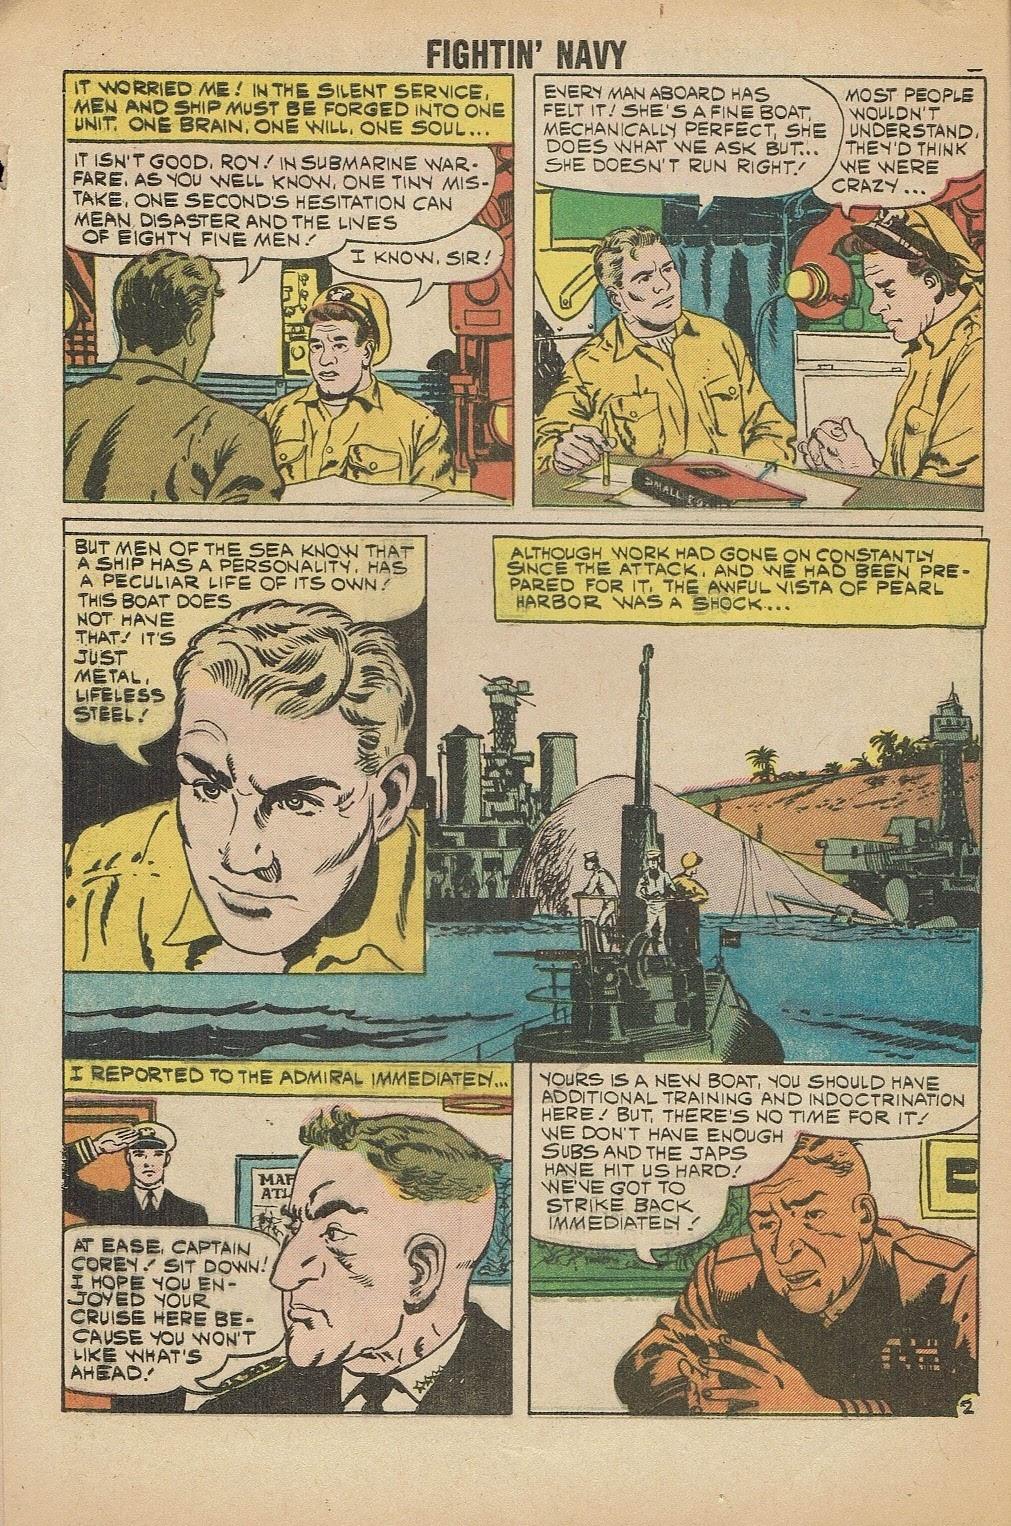 Read online Fightin' Navy comic -  Issue #91 - 4